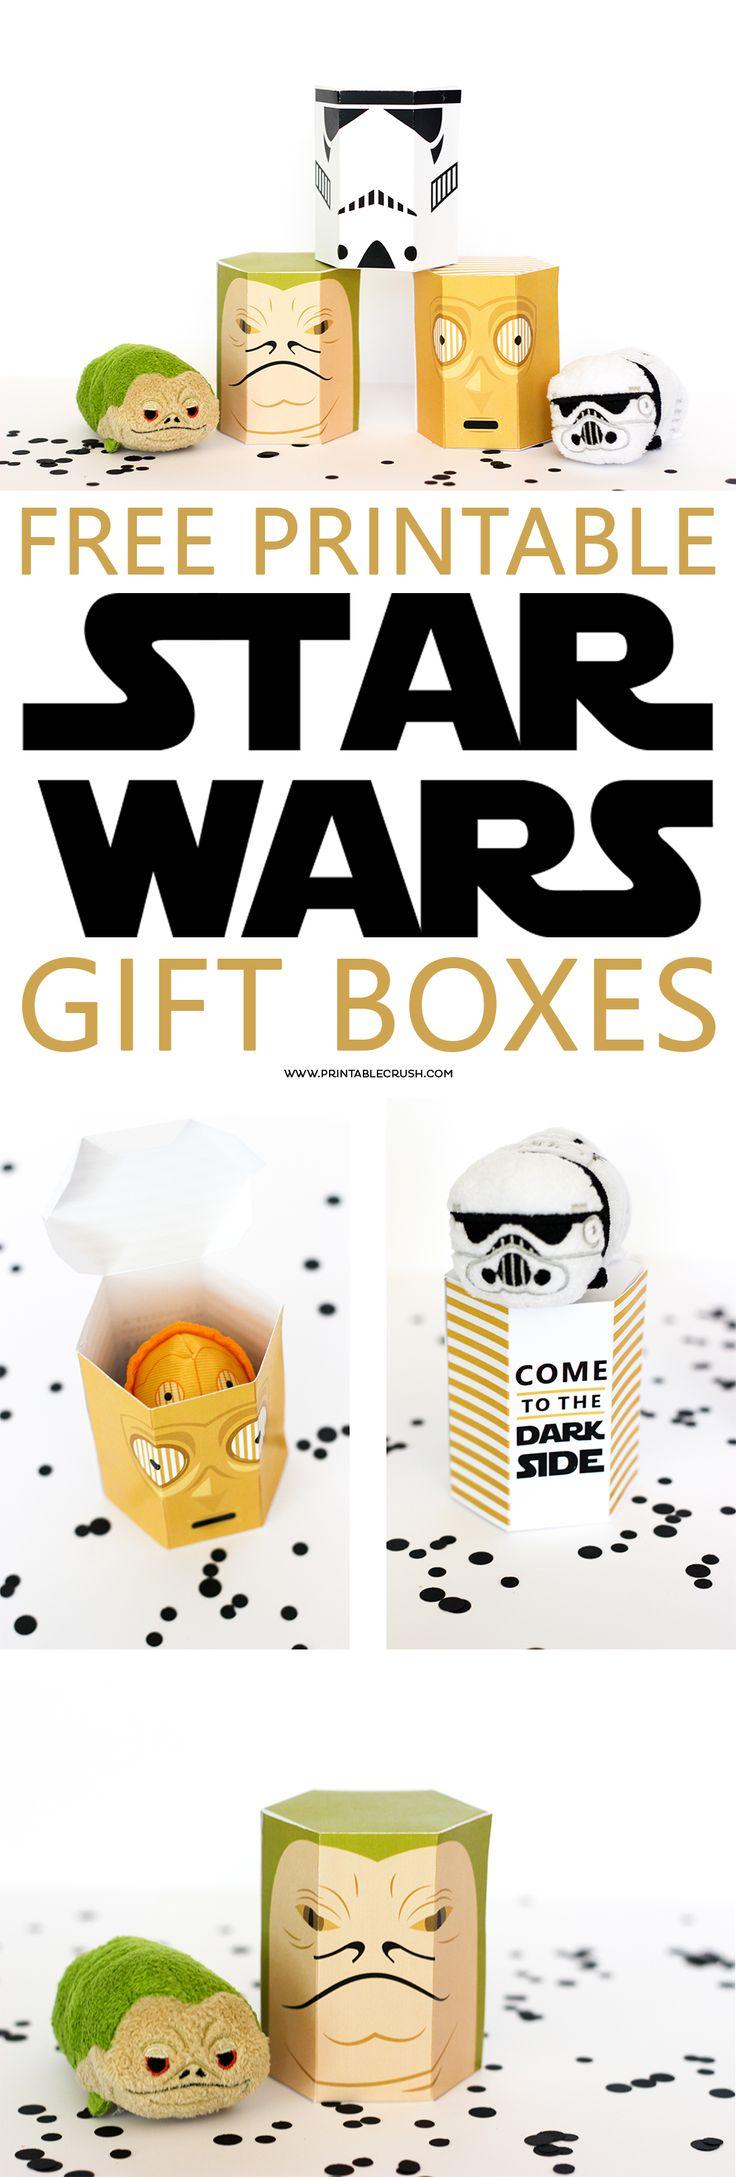 FREE Star Wars Printable Gift Boxes